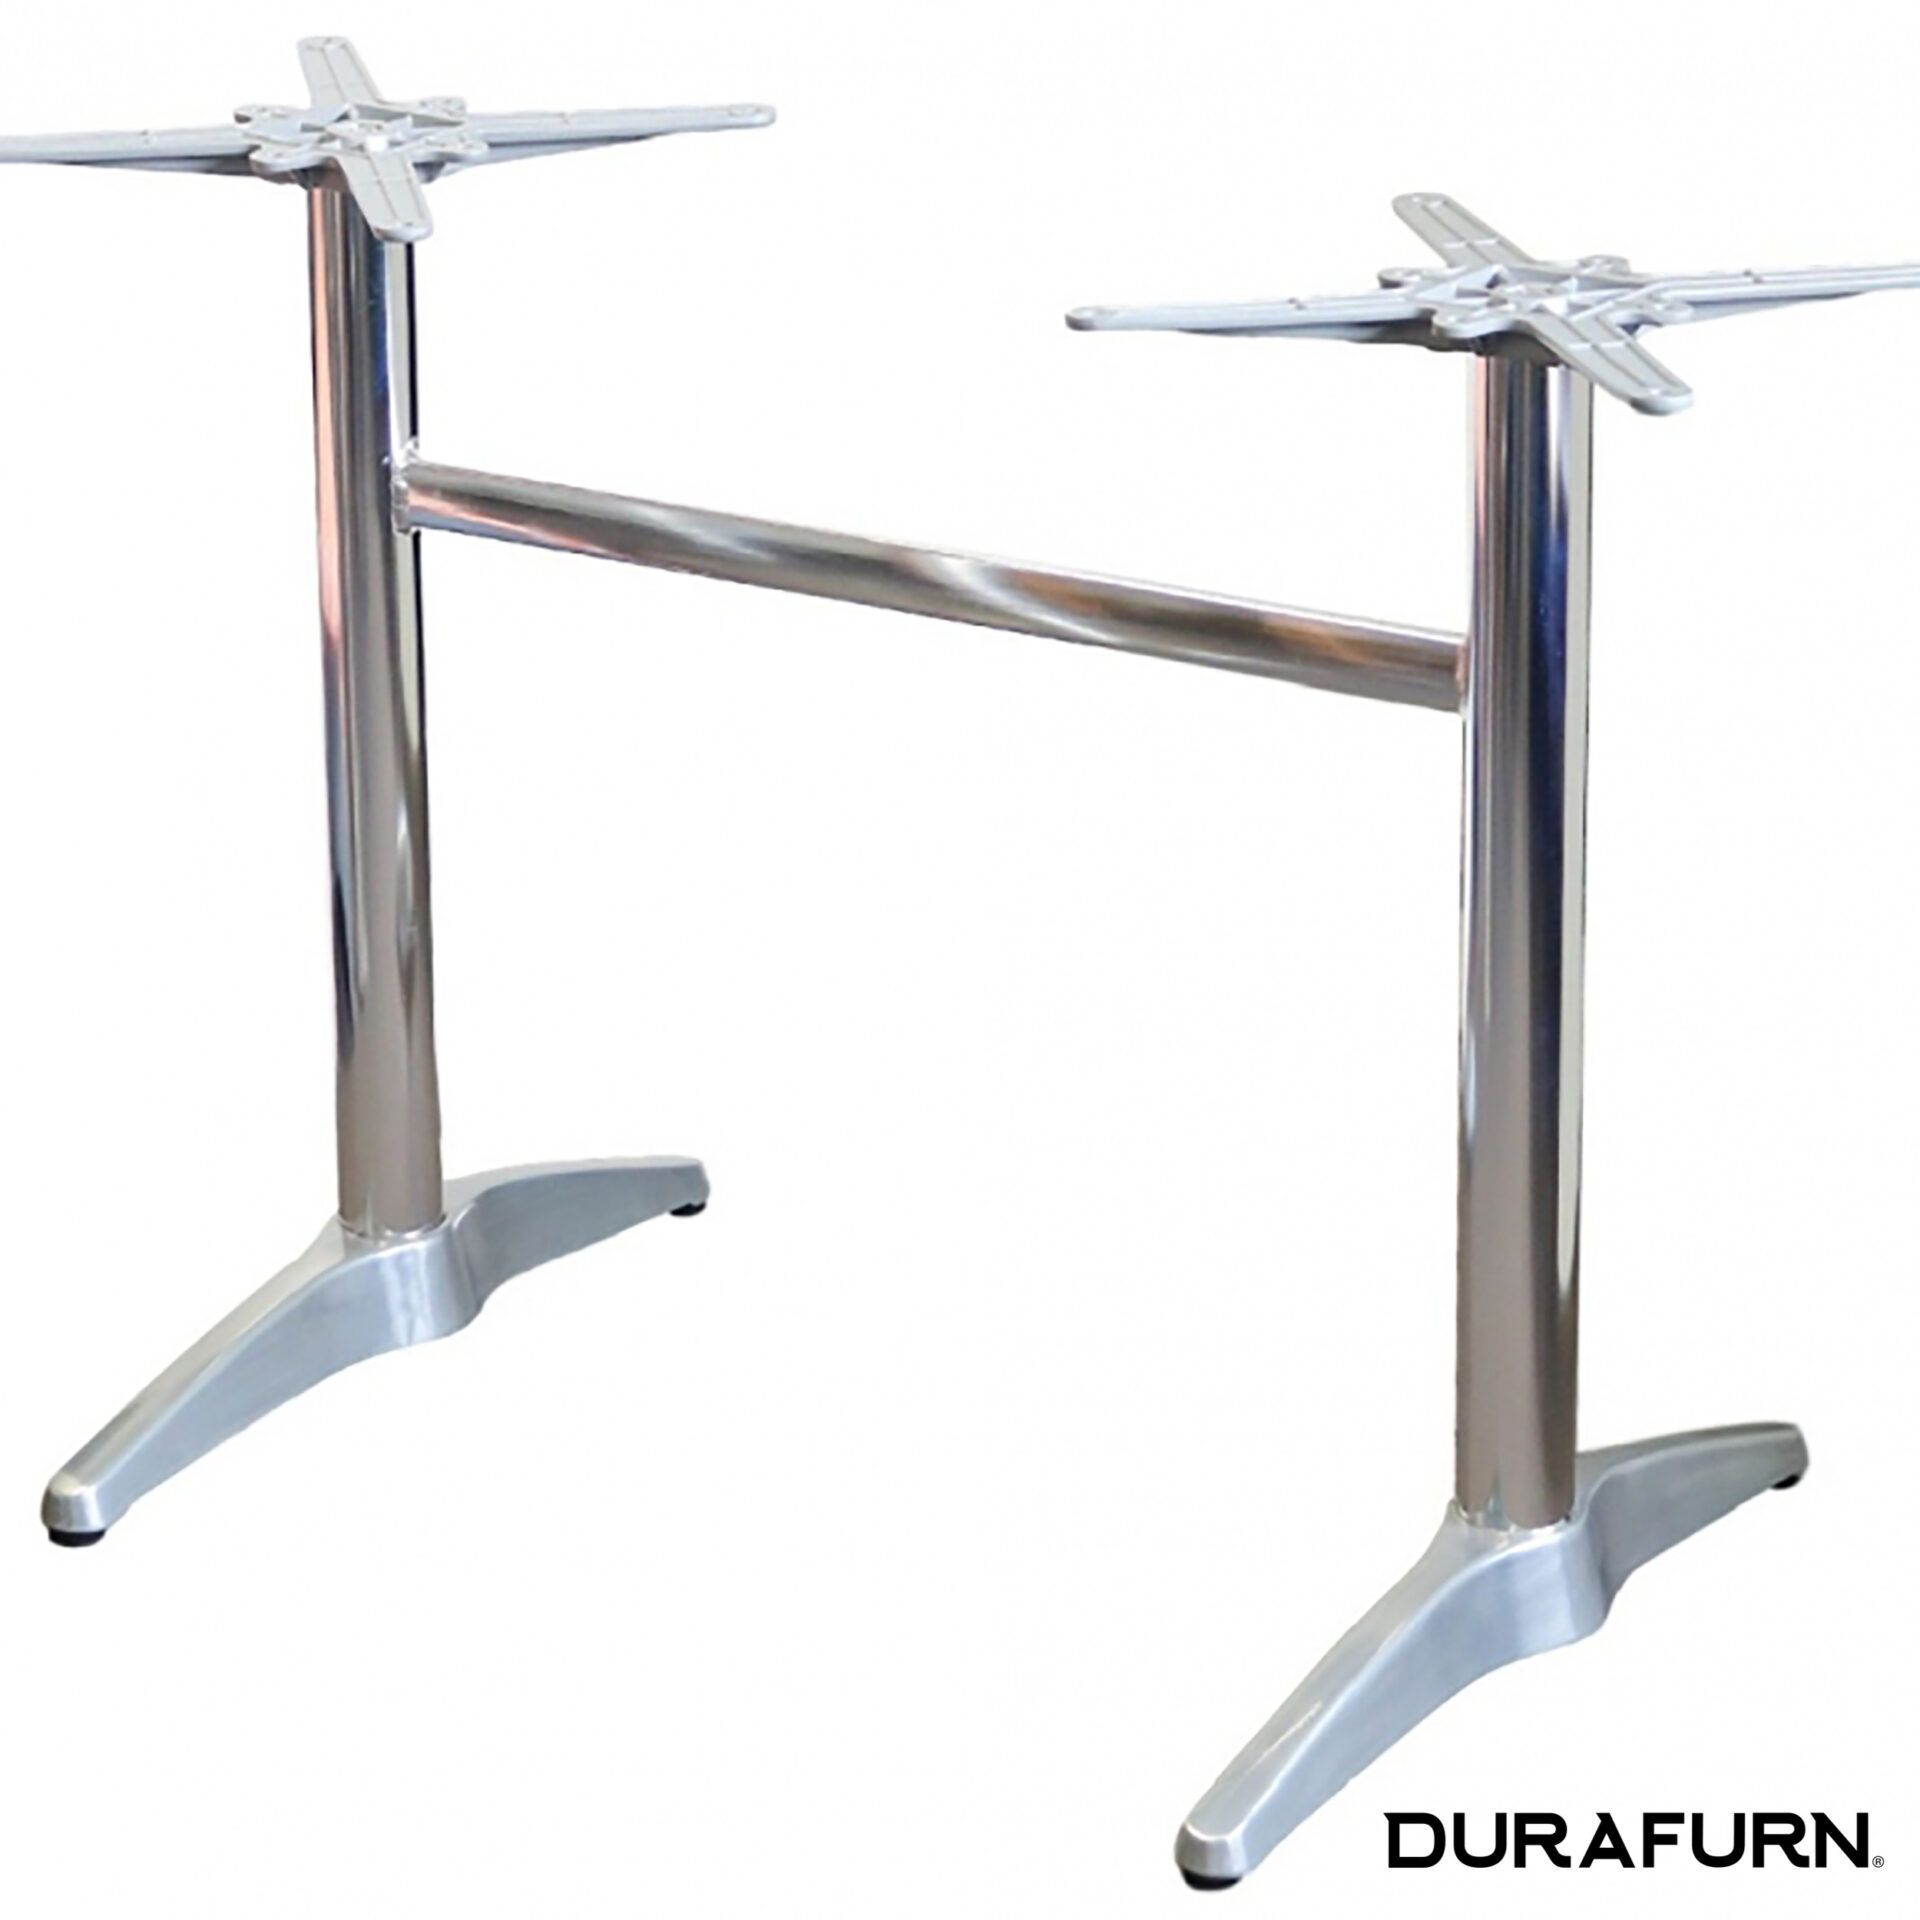 astoria aluminium twin table basevjnykg